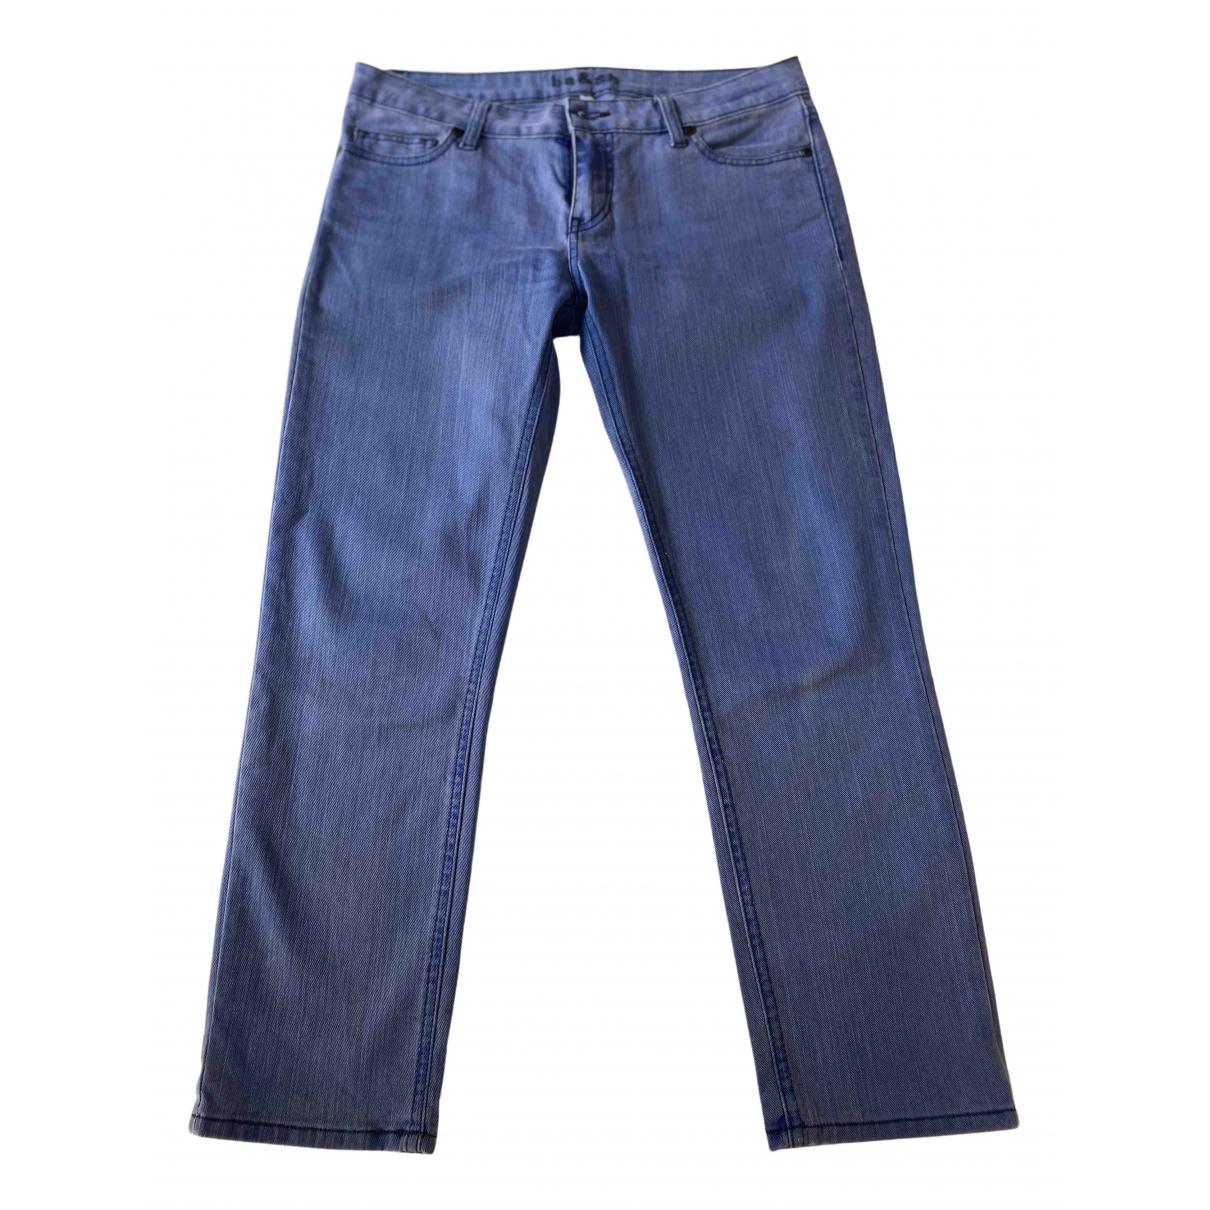 Ba&sh \N Blue Denim - Jeans Jeans for Women 38 FR